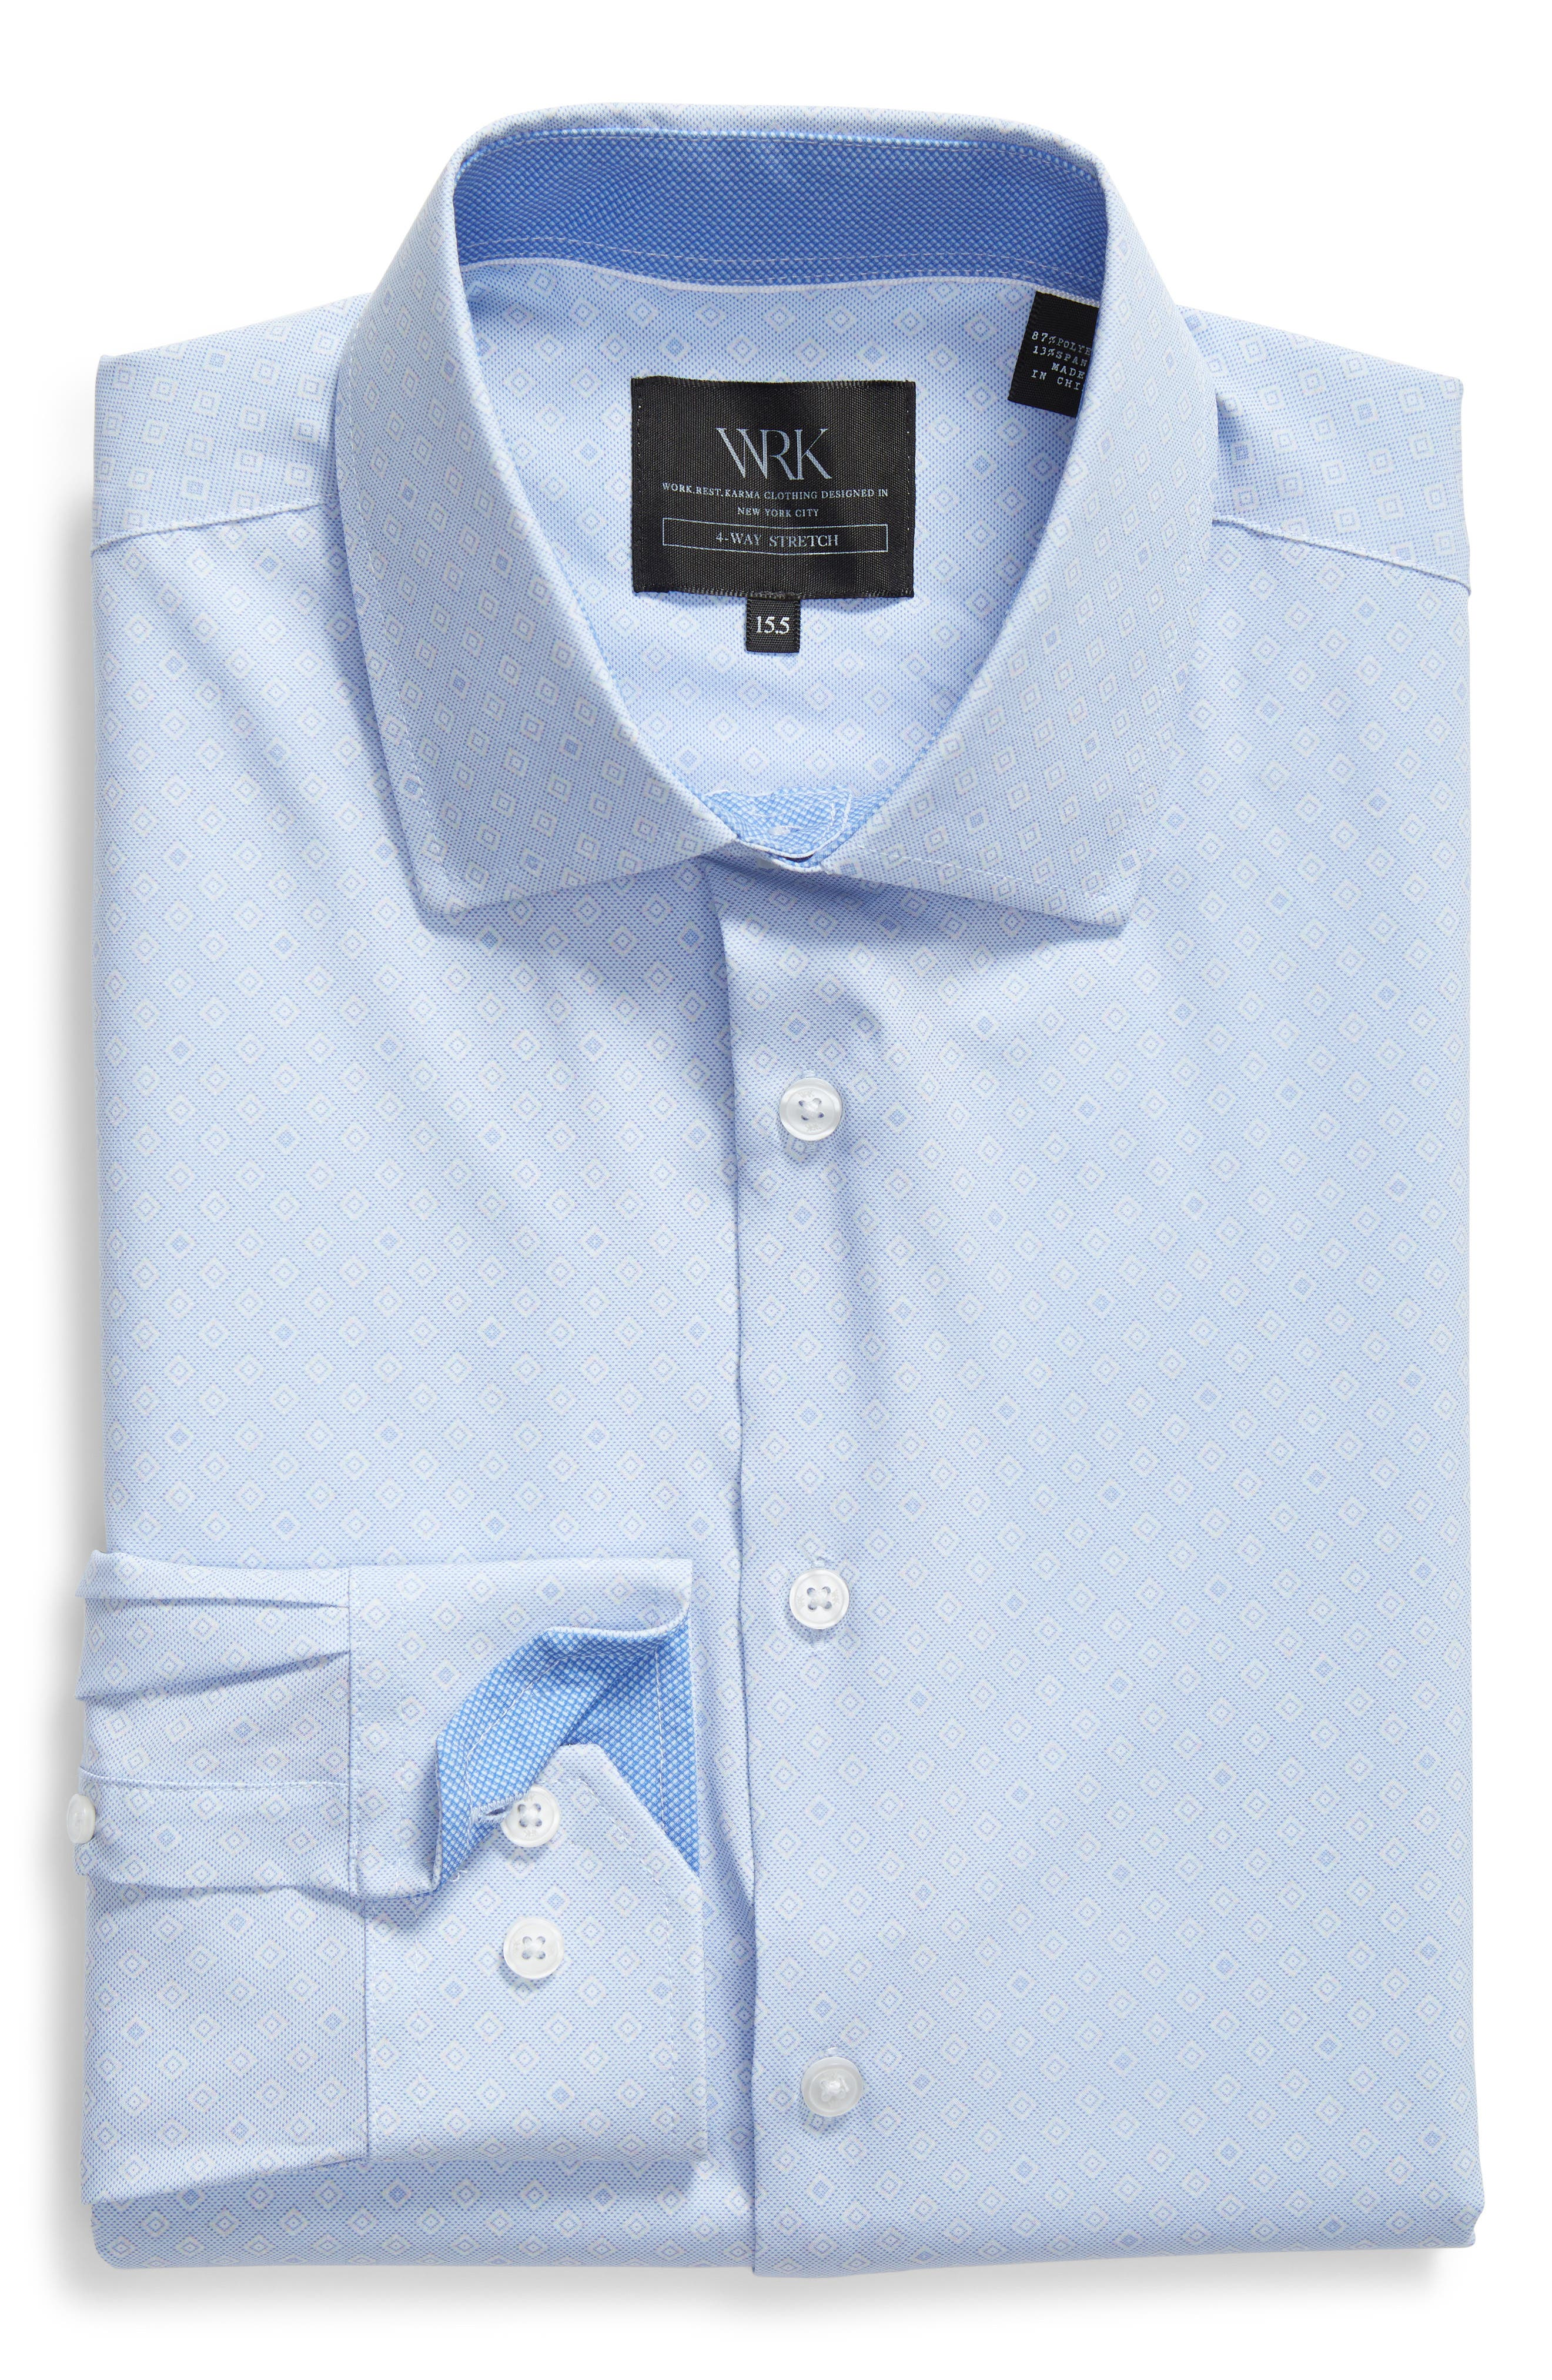 Trim Fit Geometric 4-Way Stretch Dress Shirt,                             Alternate thumbnail 5, color,                             BLUE